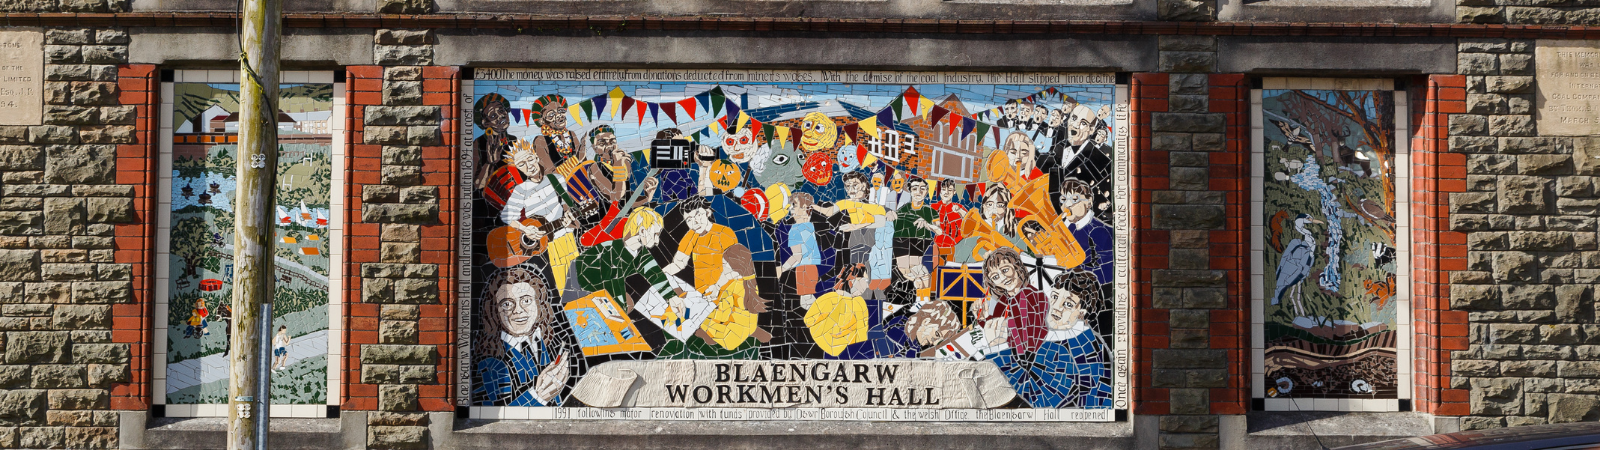 BOOK NOW FOR BLAENGARW WORKMEN'S HALL